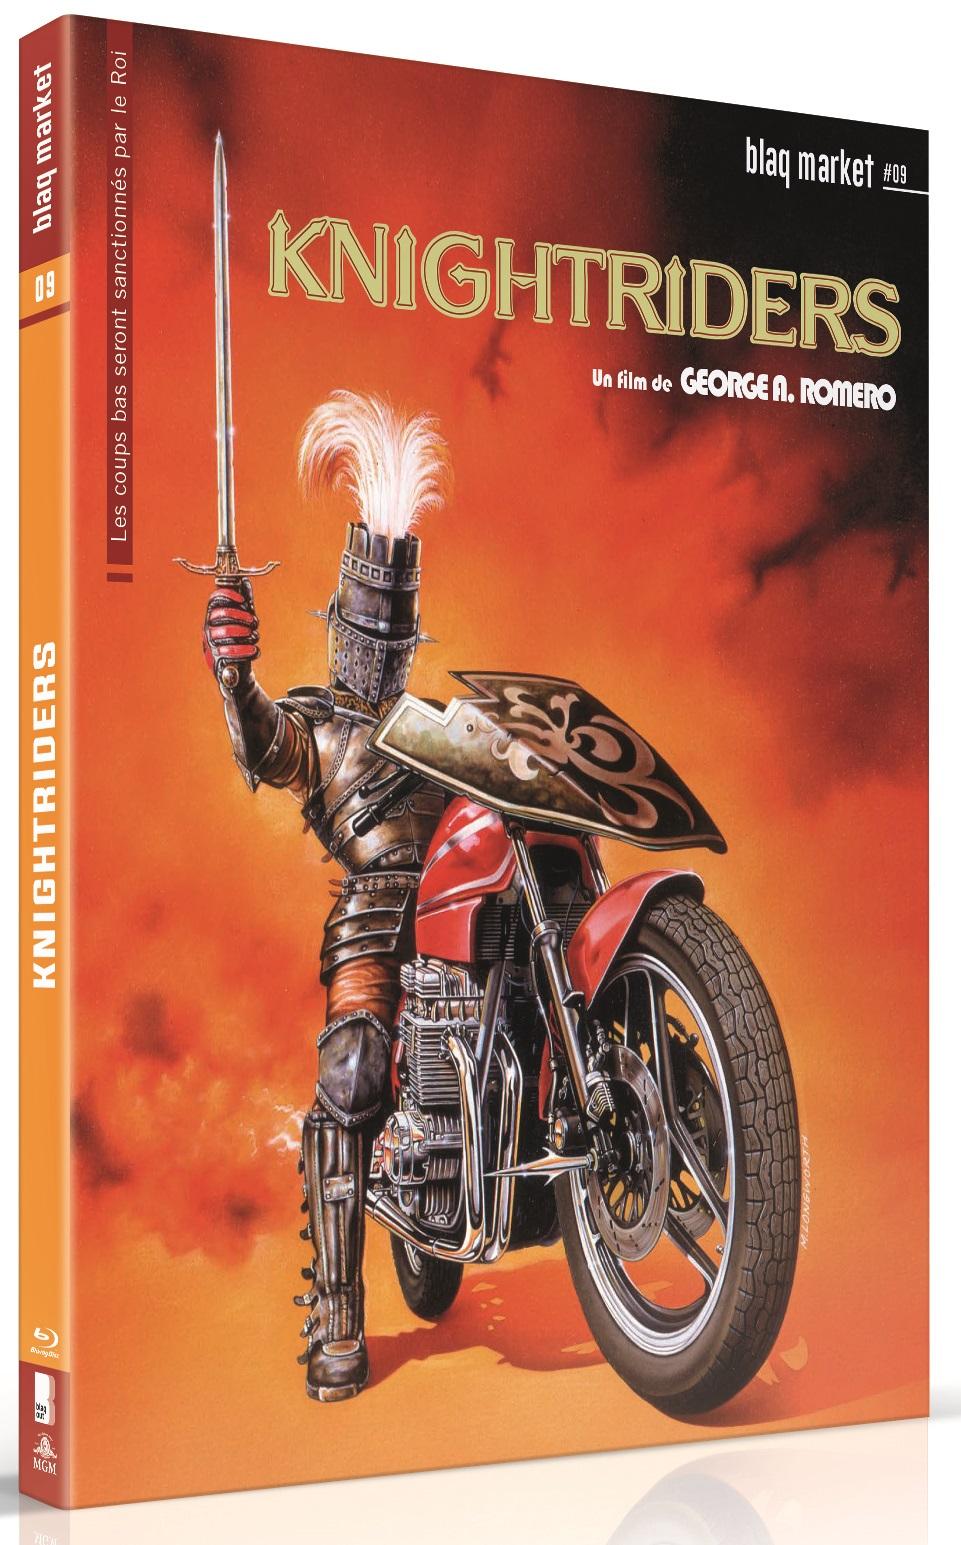 KNIGHTRIDERS - BRD